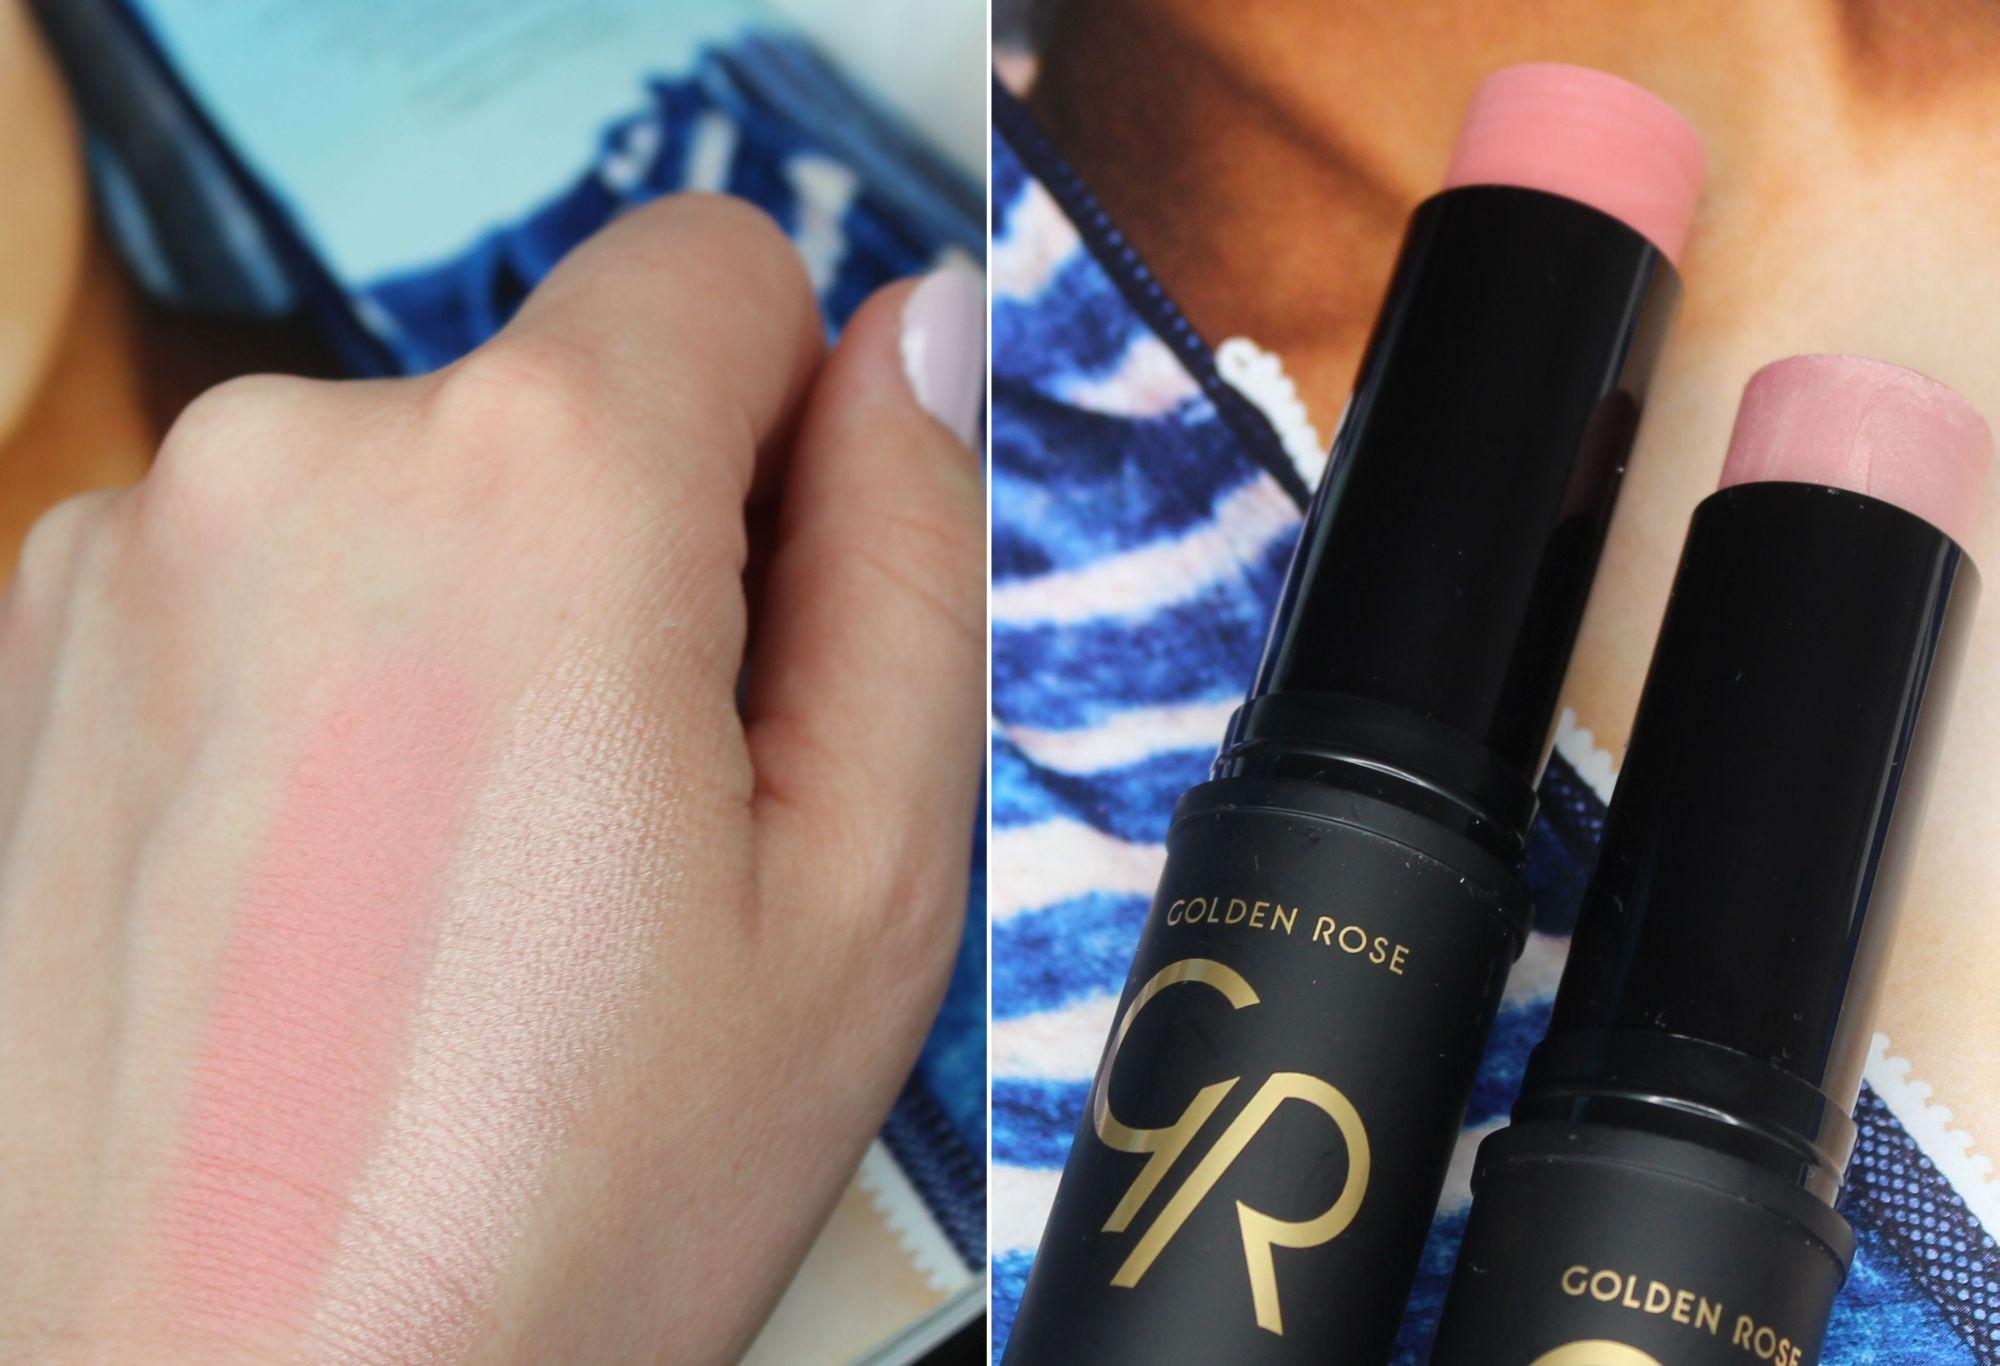 Golden Rose Creamy Blush & Highlighter Stick 2